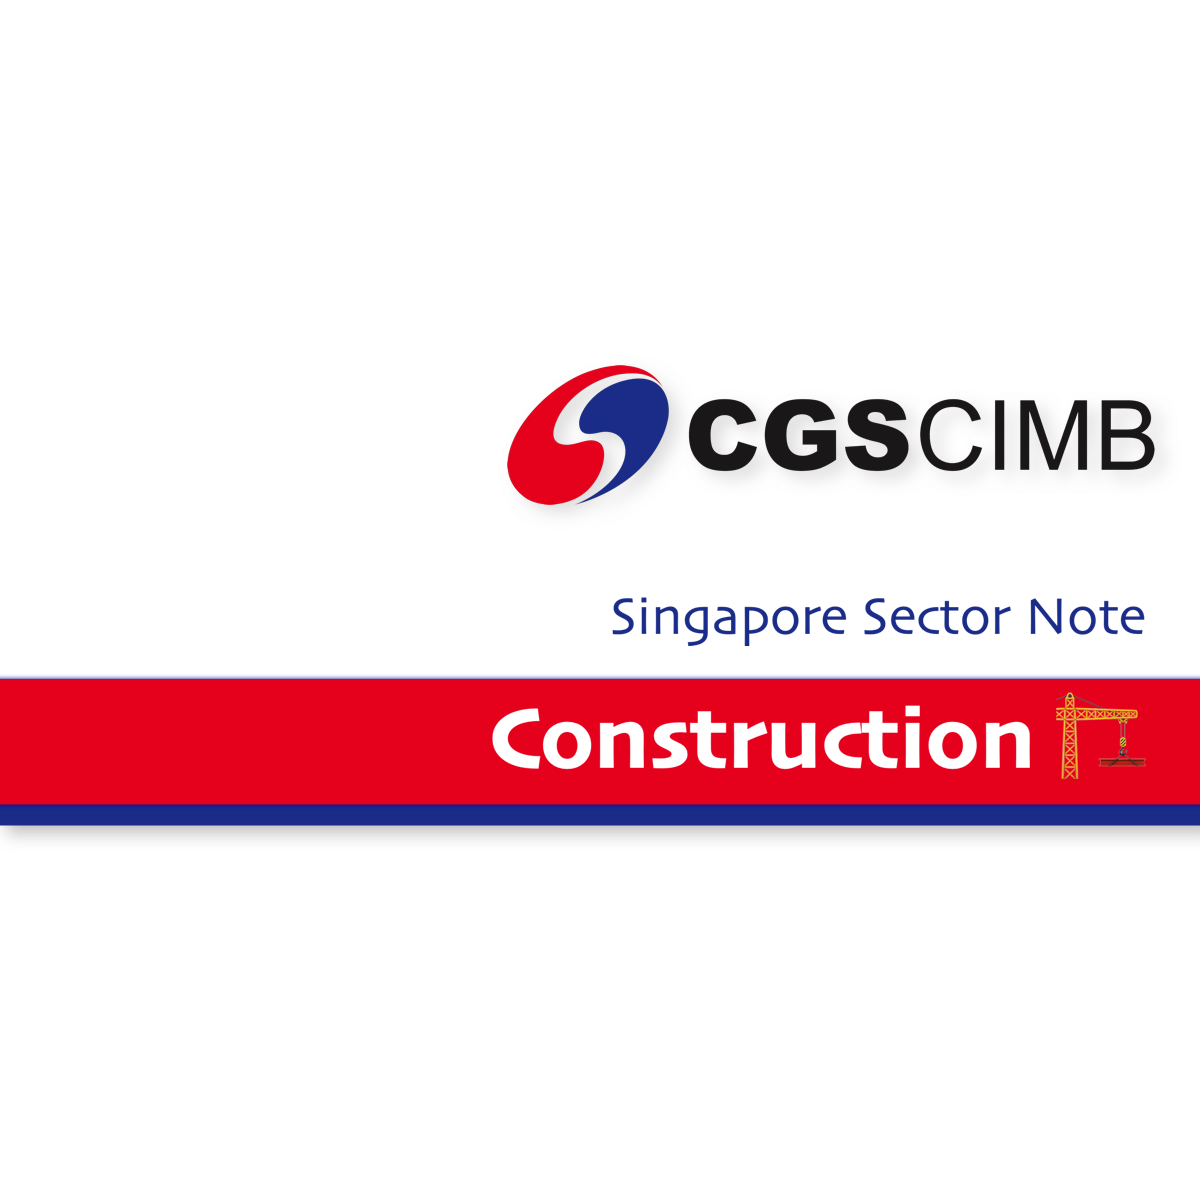 Construction Sector Singapore - CGS-CIMB Research  | SGinvestors.io